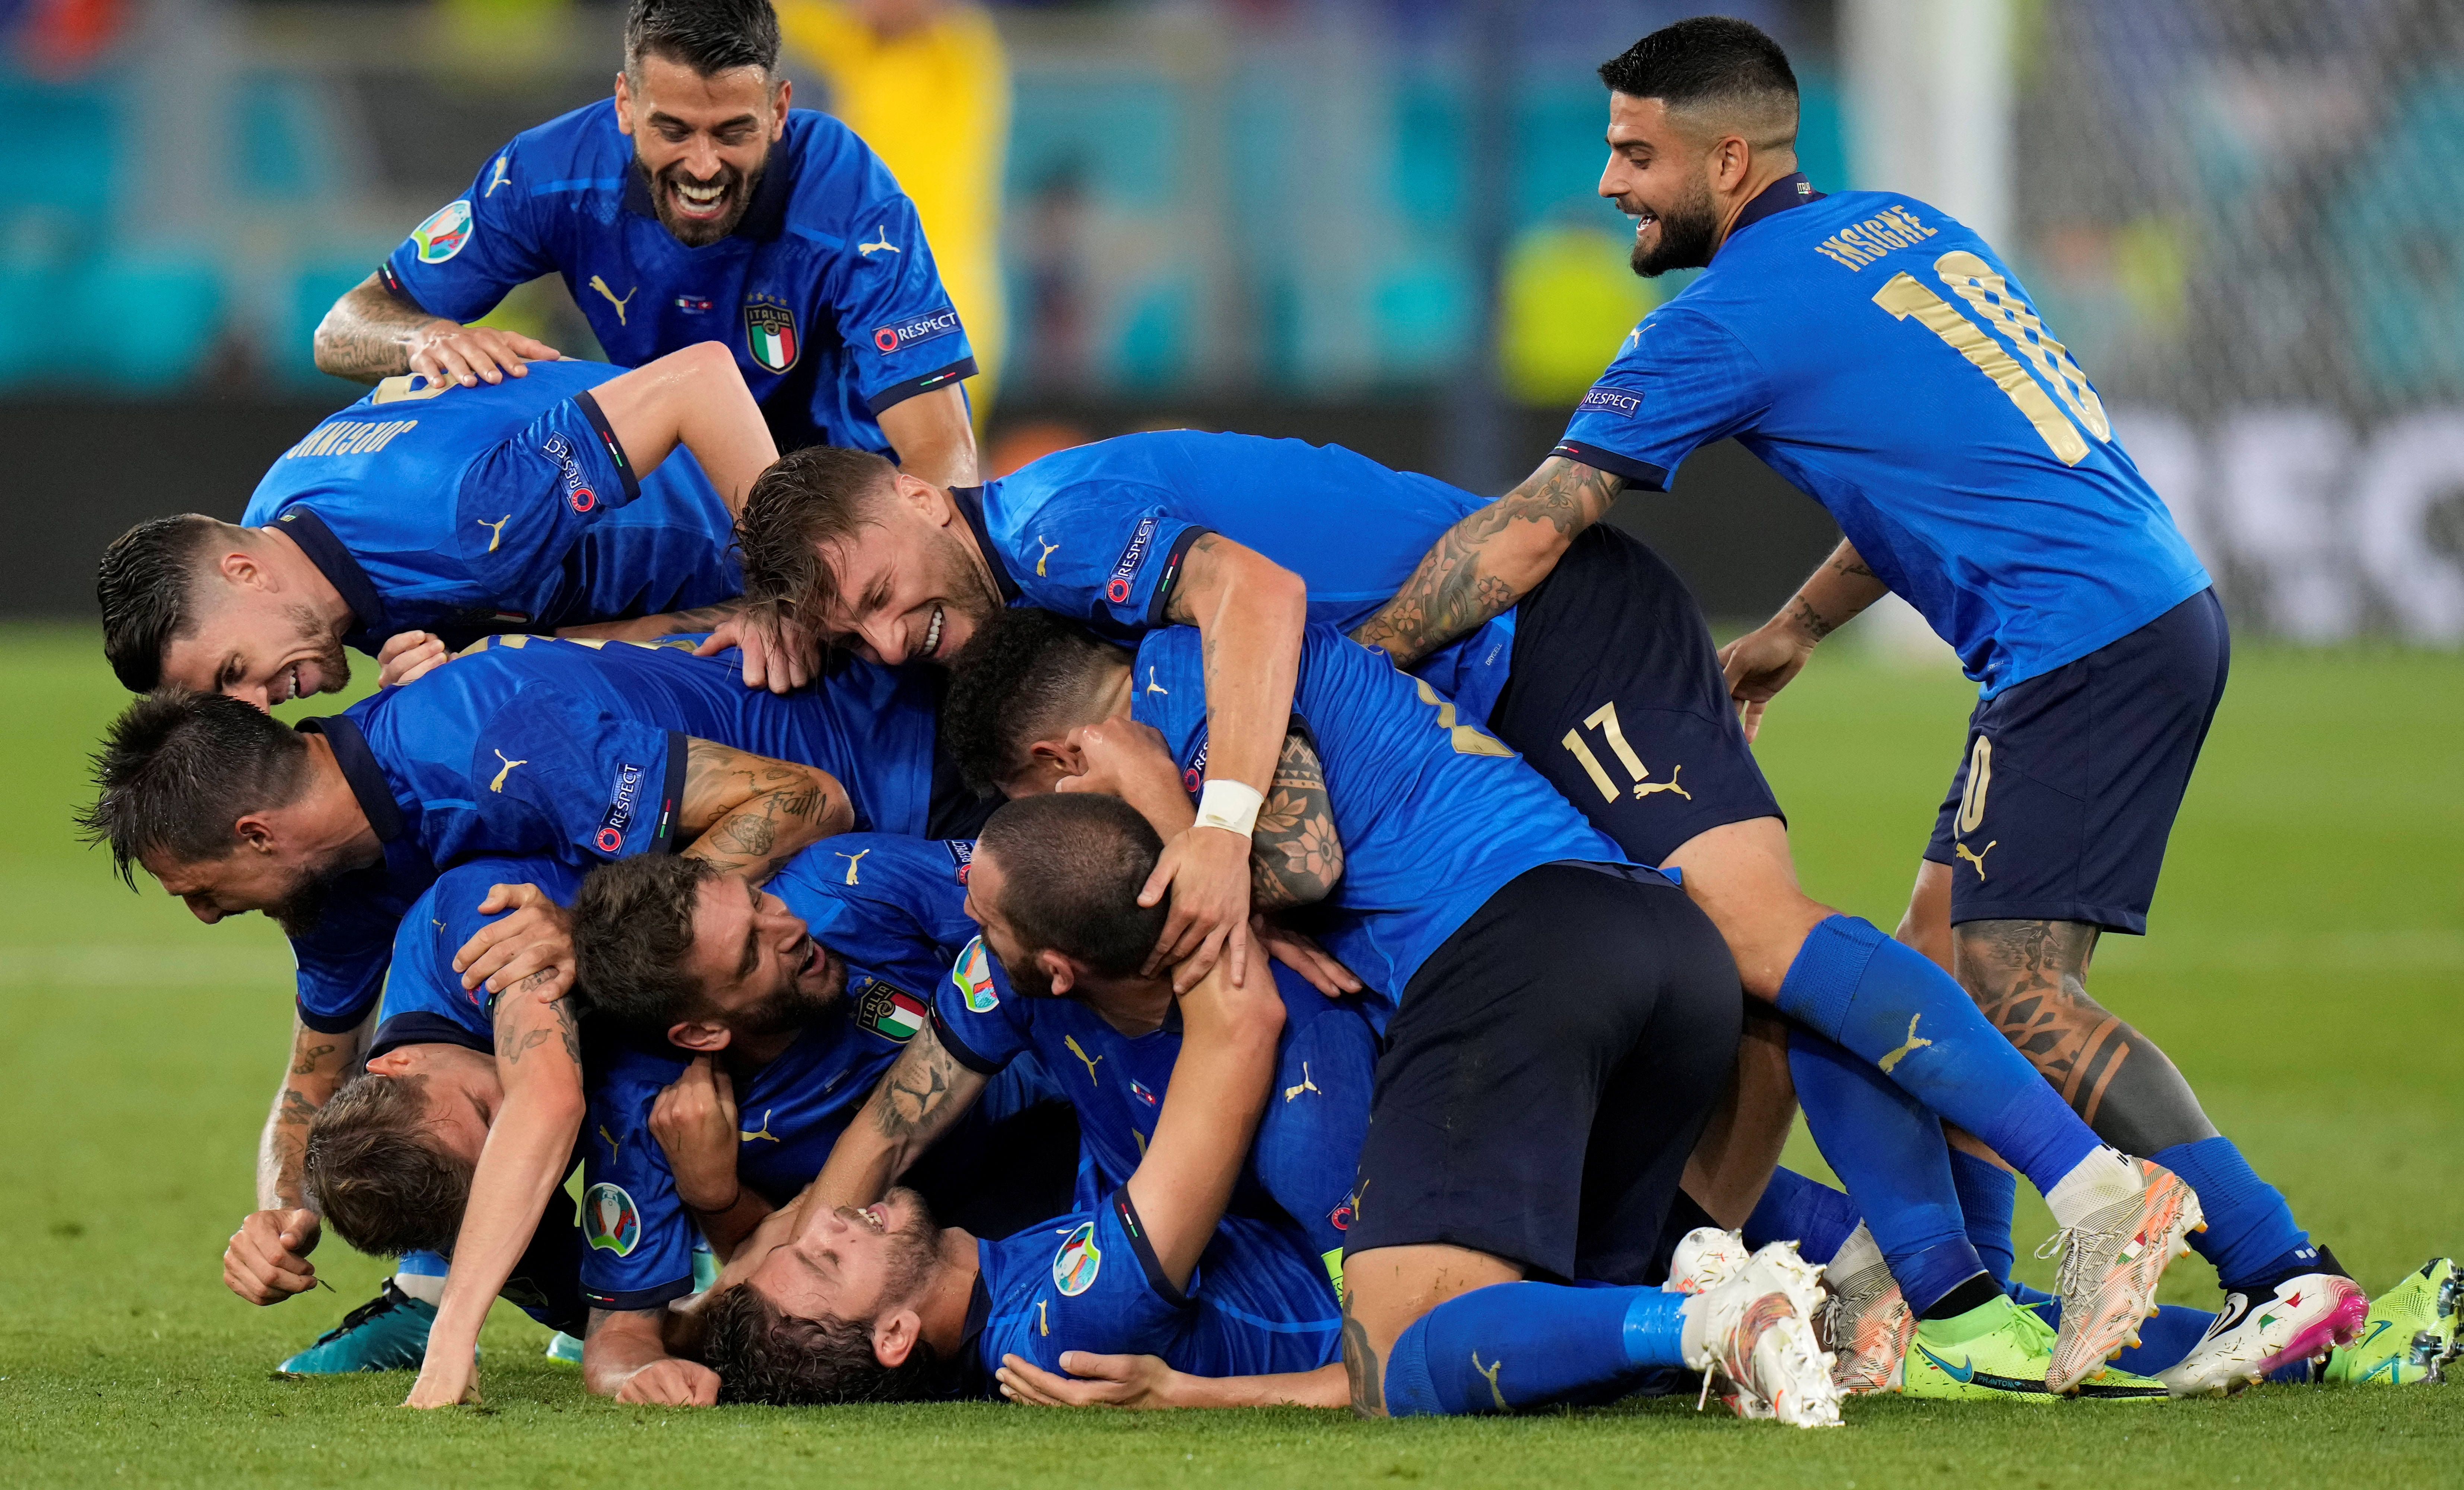 Soccer Football - Euro 2020 - Group A - Italy v Switzerland - Stadio Olimpico, Rome, Italy - June 16, 2021 Italy's Manuel Locatelli celebrates scoring their second goal with teammates Pool via REUTERS/Alessandra Tarantino     TPX IMAGES OF THE DAY